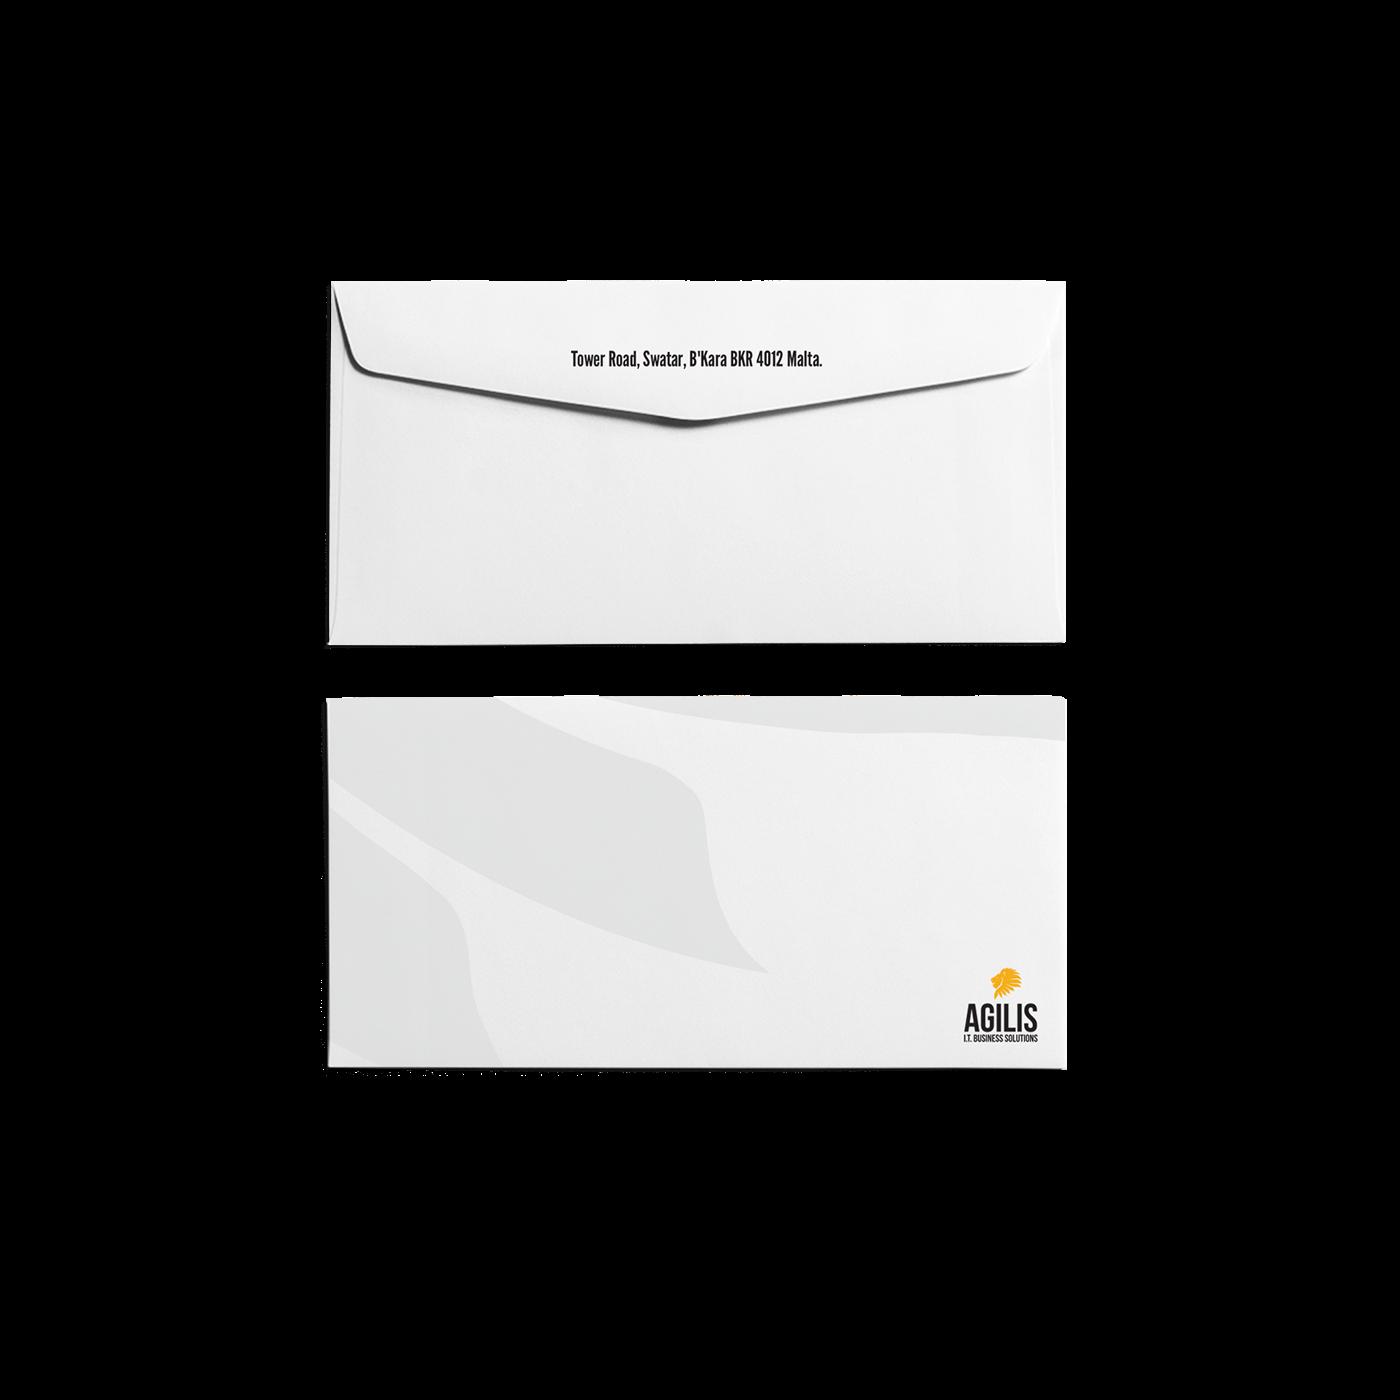 Agilis software company solutions logo stationary